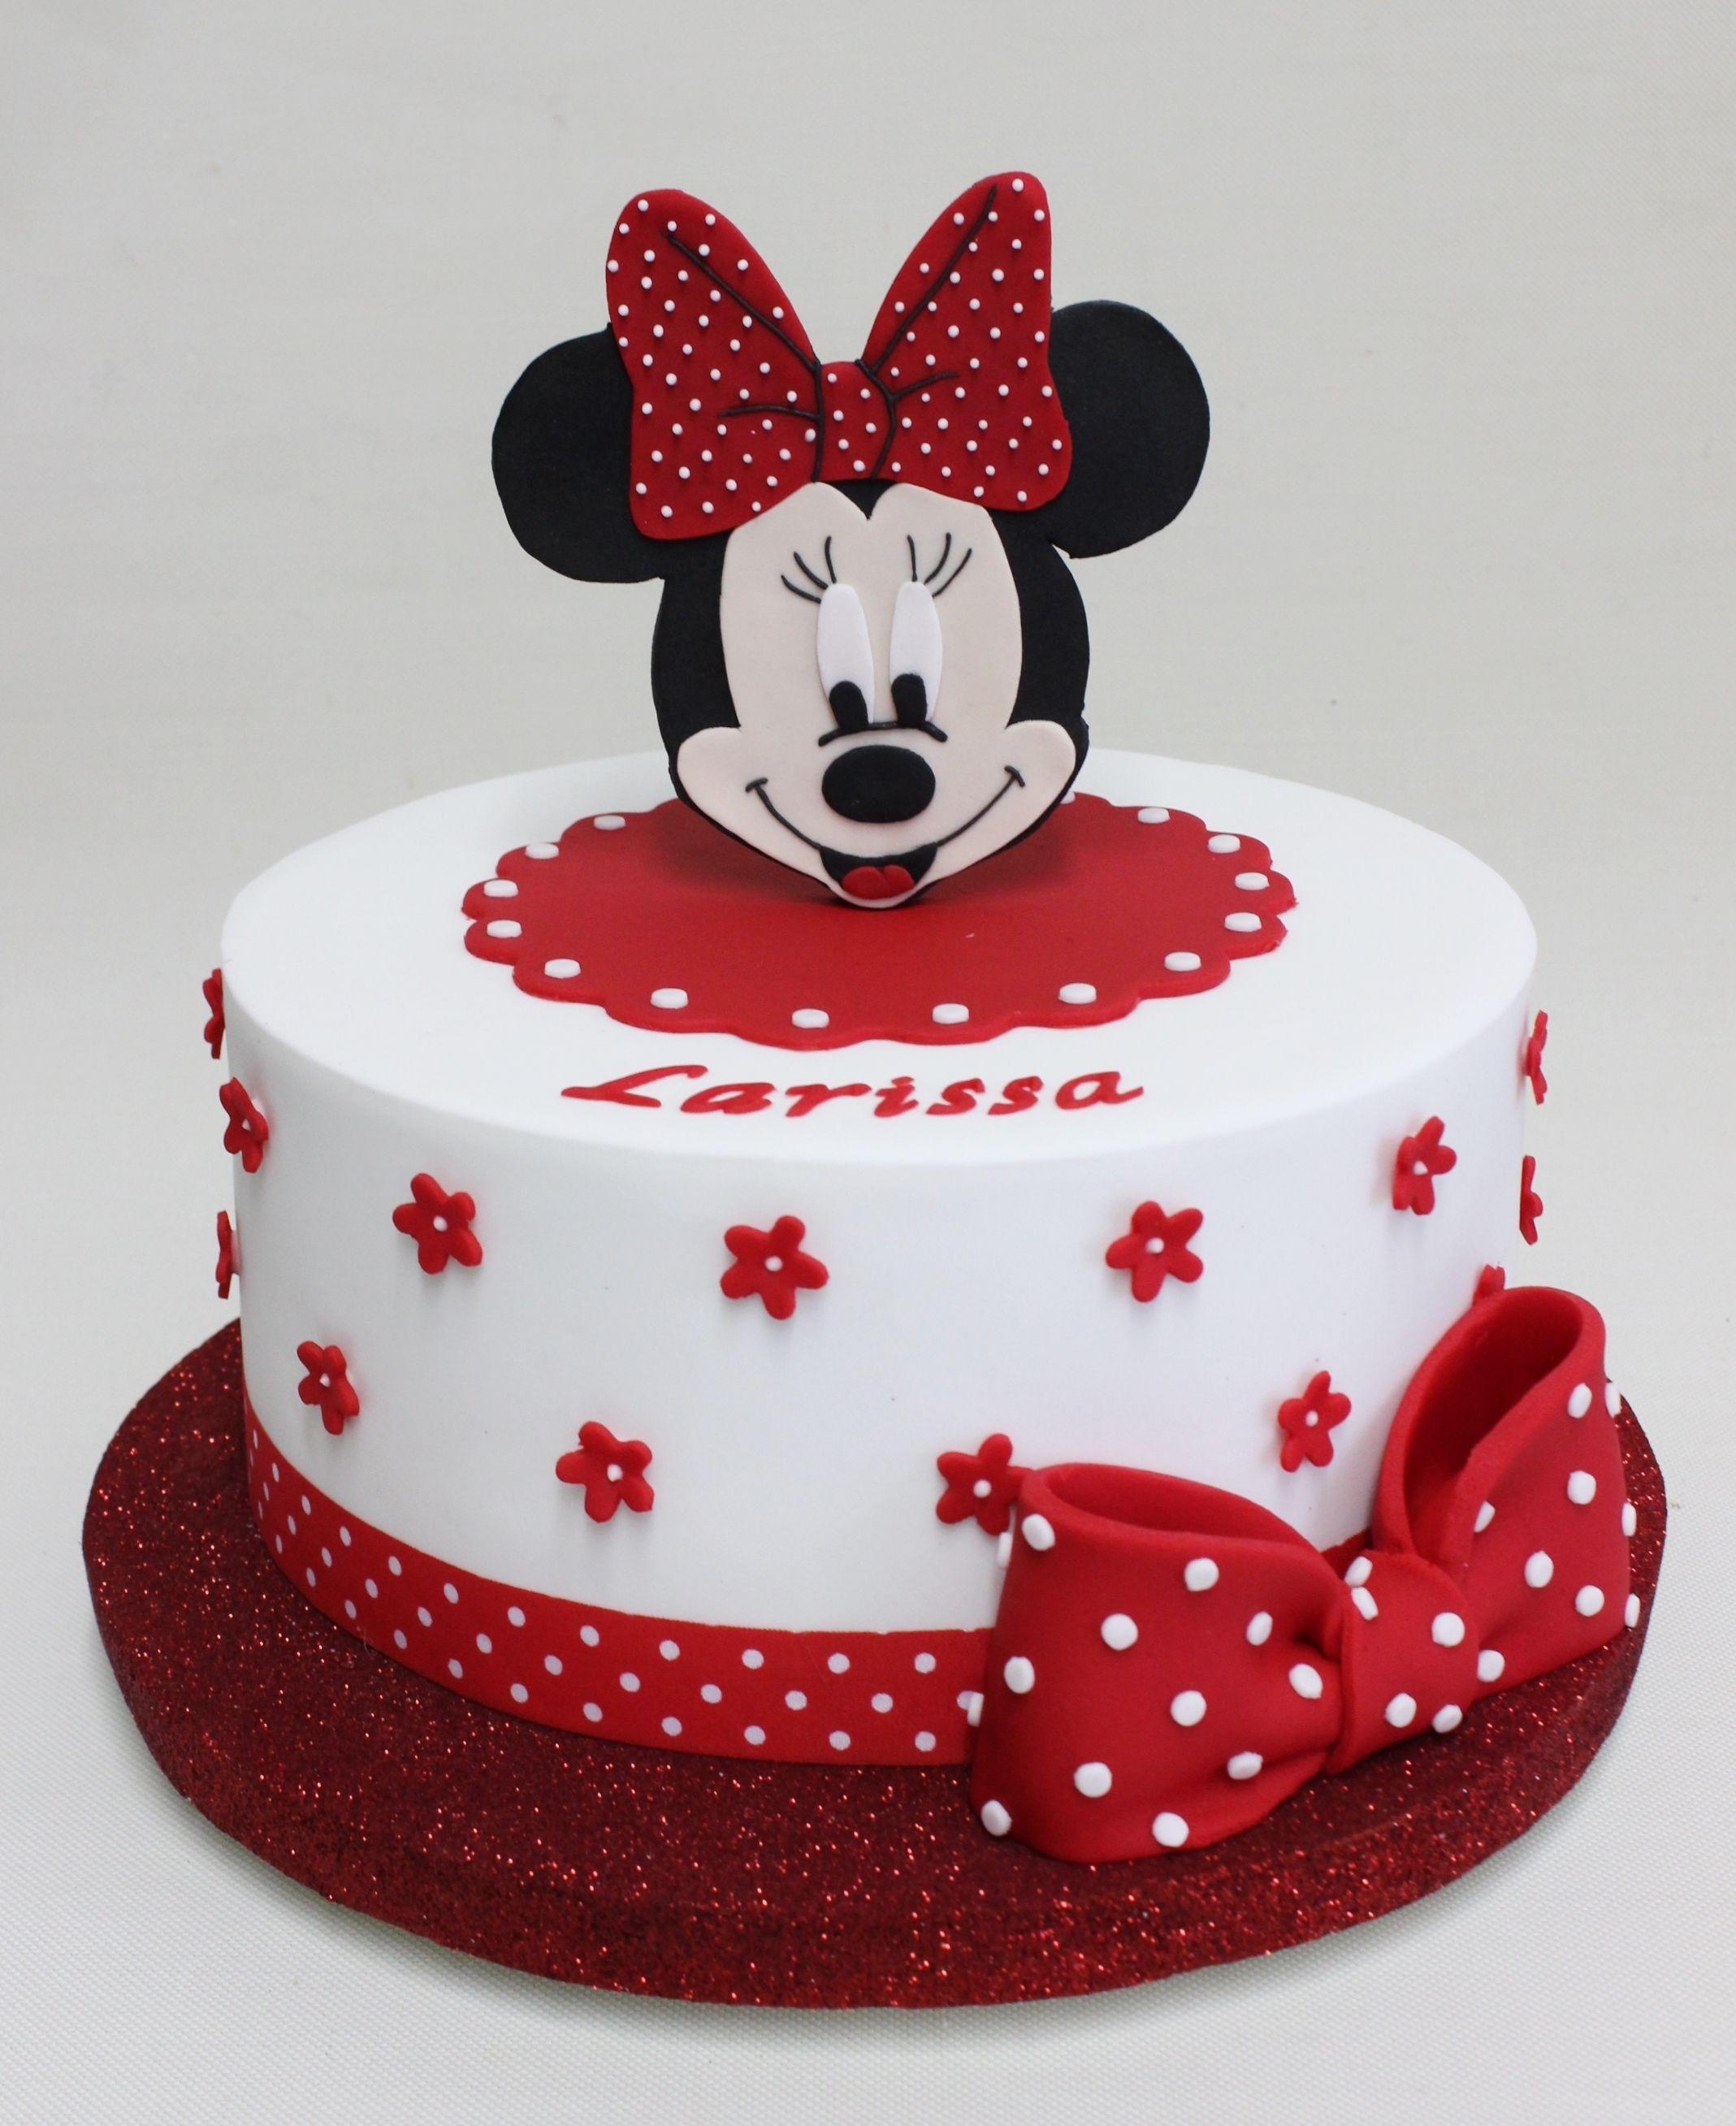 Red Minnie Mouse Cake Violeta Glace | Tortas de mickey, Pastel de minnie  mouse, Tortas de cumpleaños de minnie mouse